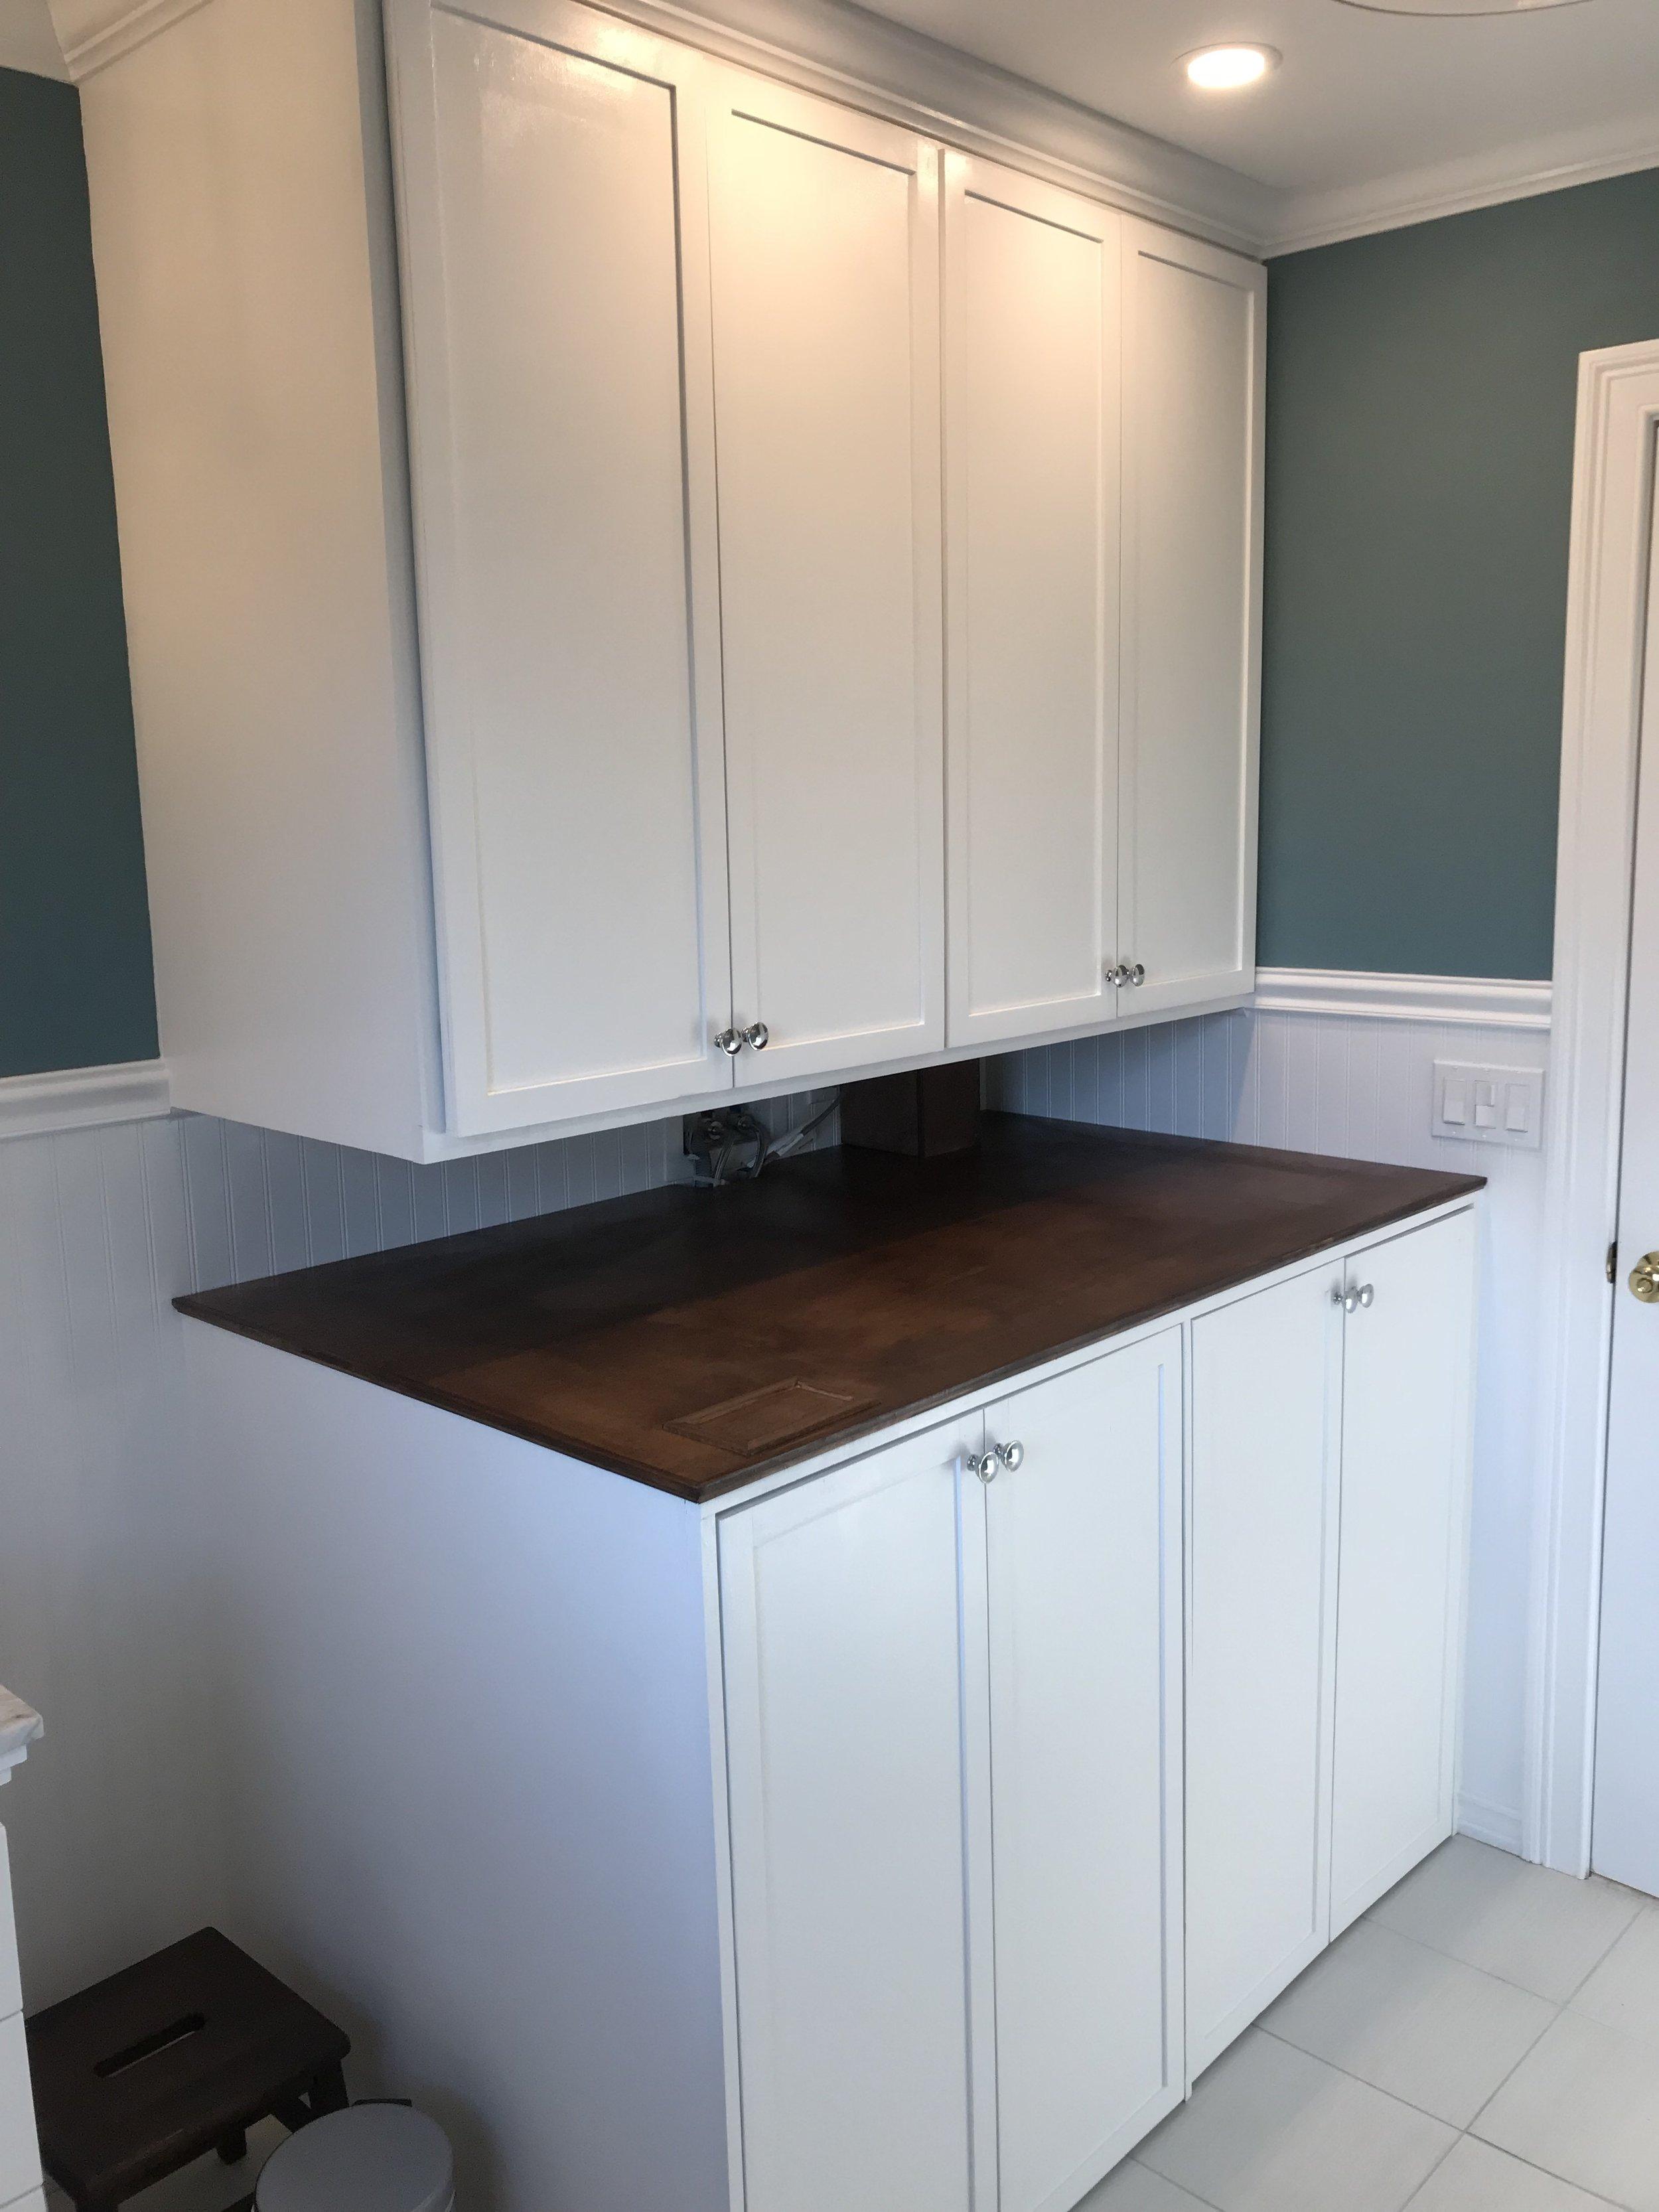 Shaw Remodeling - Bathroom Remodel in East Lyme CT